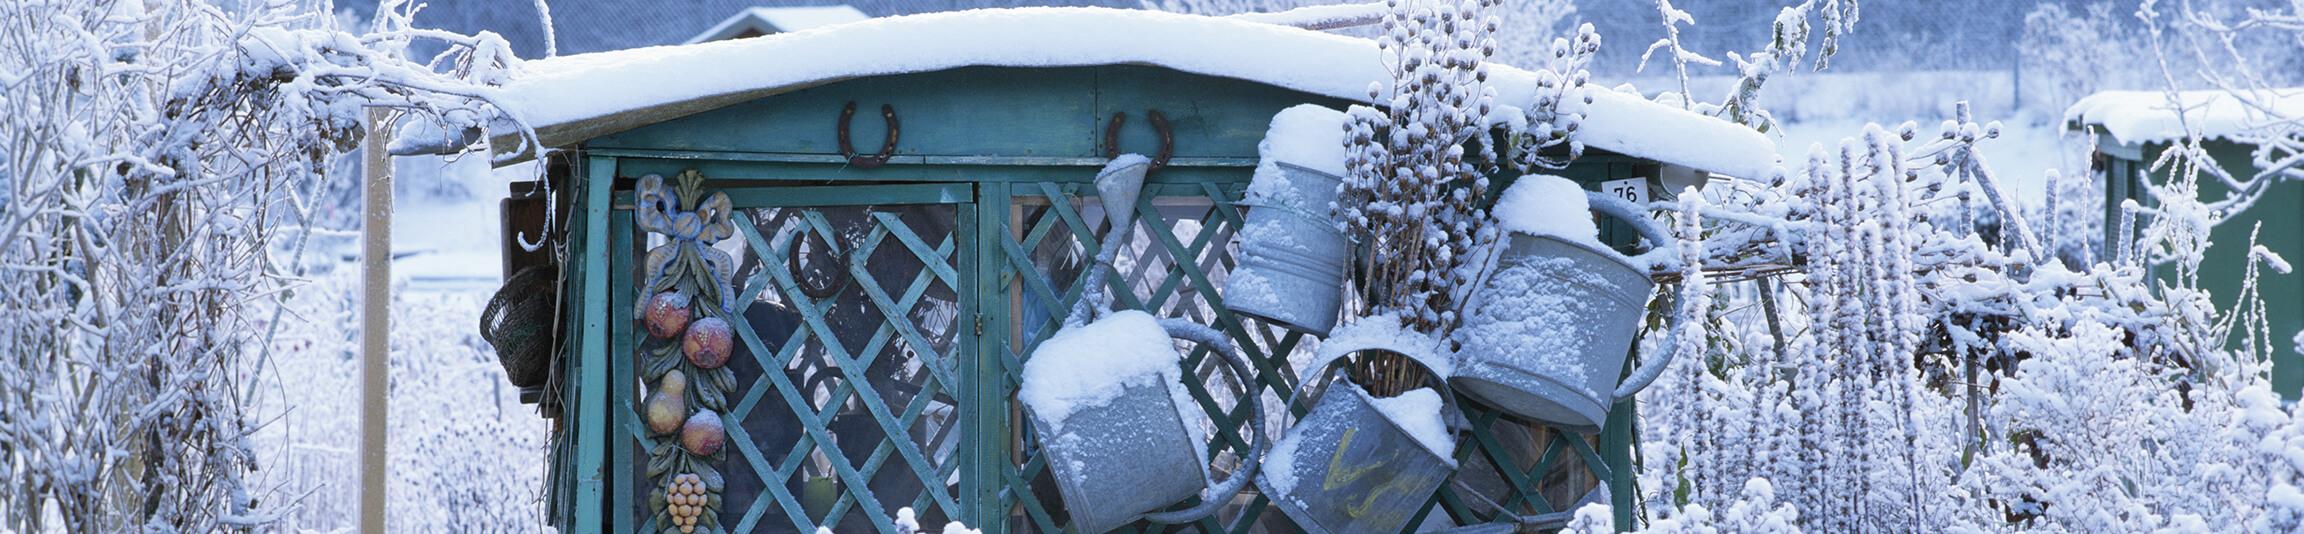 January Gardening Guide